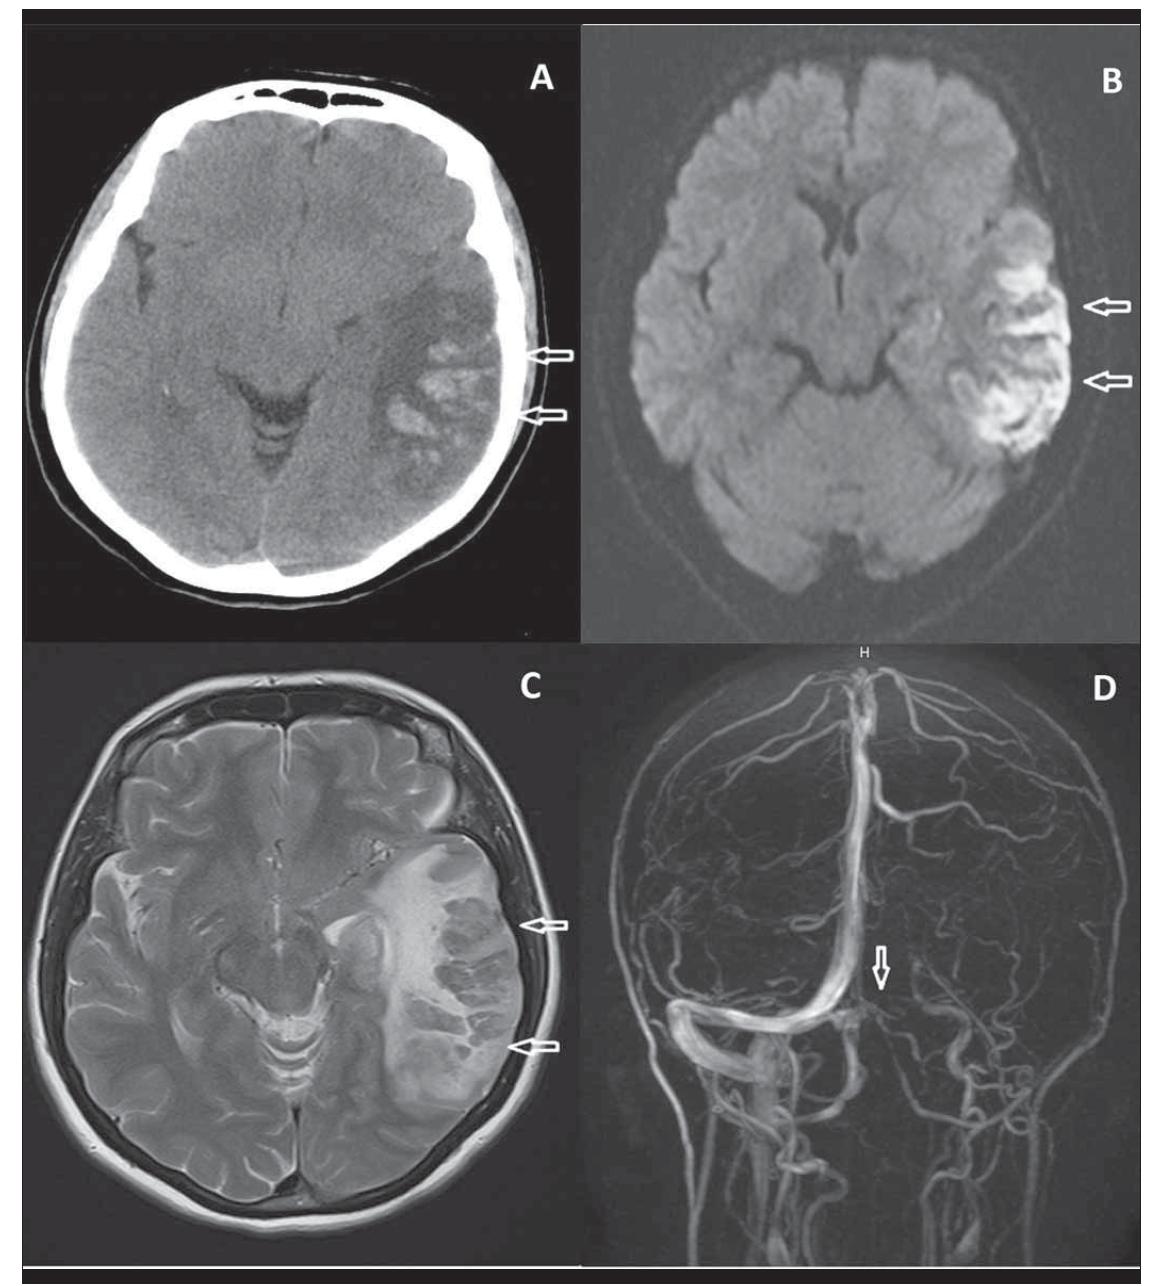 Fig. 1. (A) CT – broad, expansive, hypodense area (arrows) harbouring haemorrhagic foci up to 2 cm in the left temporoparietal region. (B) MRI, diff usion weighted image – restricted diff usion (arrows) in the left temporoparietal region. (C) MRI, T2-weighted image – large left temporooccipital cortical-subcortical hyperintense lesion with focal haemorrhage. (D) MRI venography – absence of fl ow (arrow) in the left transverse and sigmoid sinuses.<br> Obr. 1. (A) CT – rozsáhlá expandující hypodenzní oblast (šipky) obsahující až 2 cm velká hemoragická ložiska v levé temporoparietální oblasti. (B) Difúzí vážená MR – restrikce difúze (šipky) v levé temporoparietální oblasti. (C) MR, T2 vážený obraz – vlevo rozsáhlé temporookcipitální kortikální až subkortikální hyperintenzní ložisko s fokální hemoragií. (D) MR venografi e – absence průtoku (šipka) v levém sinus transversalis a sinus sigmoideus.